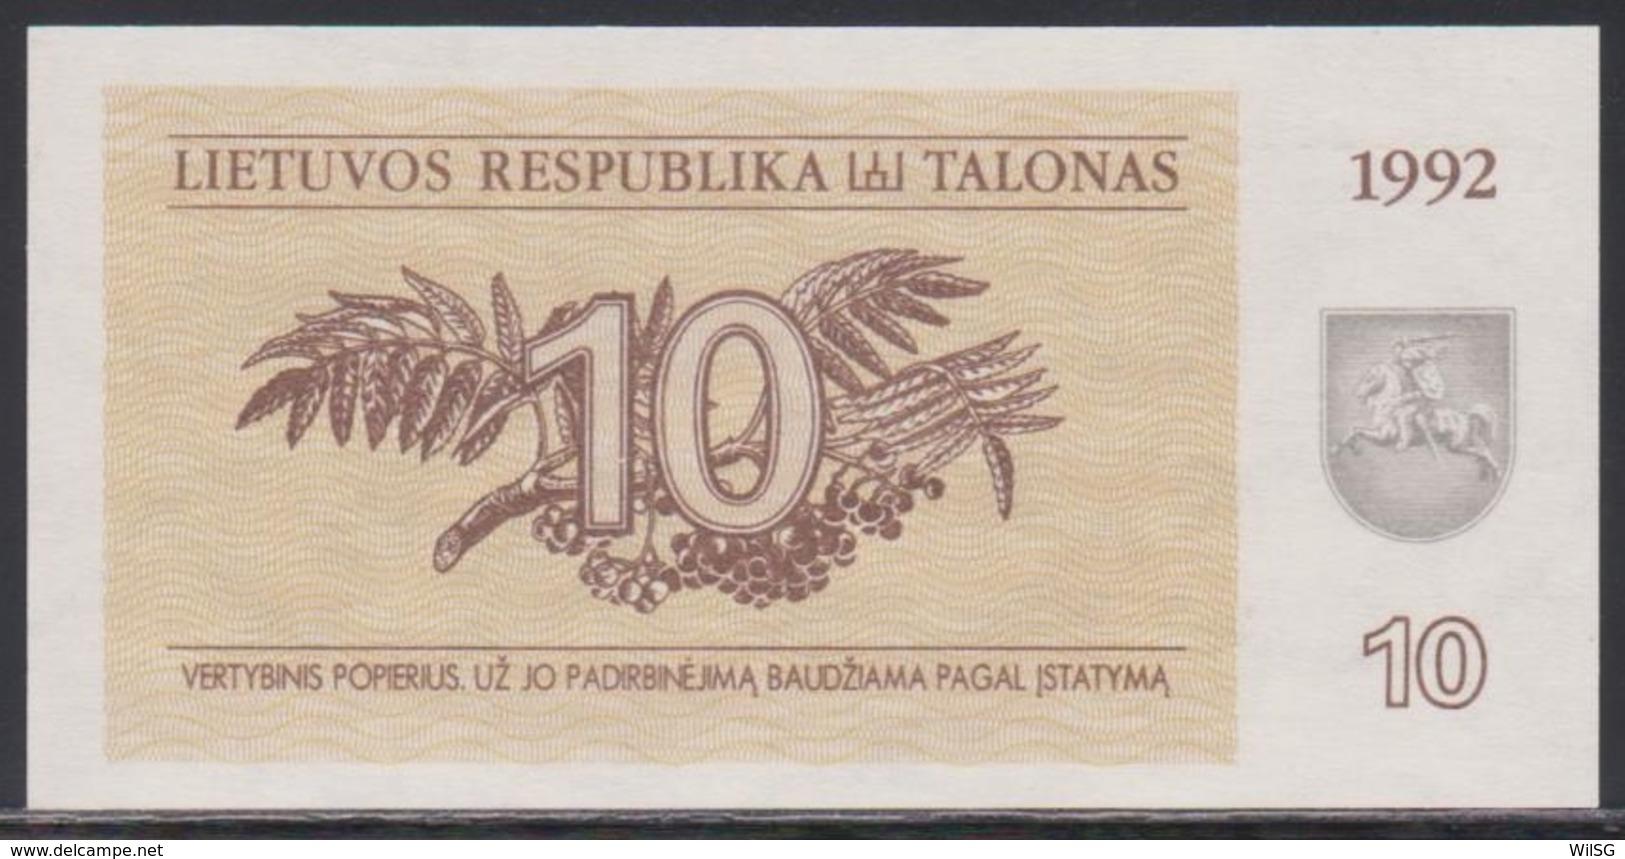 Lithuania 10 Talonas 1992 UNC - Lithuania